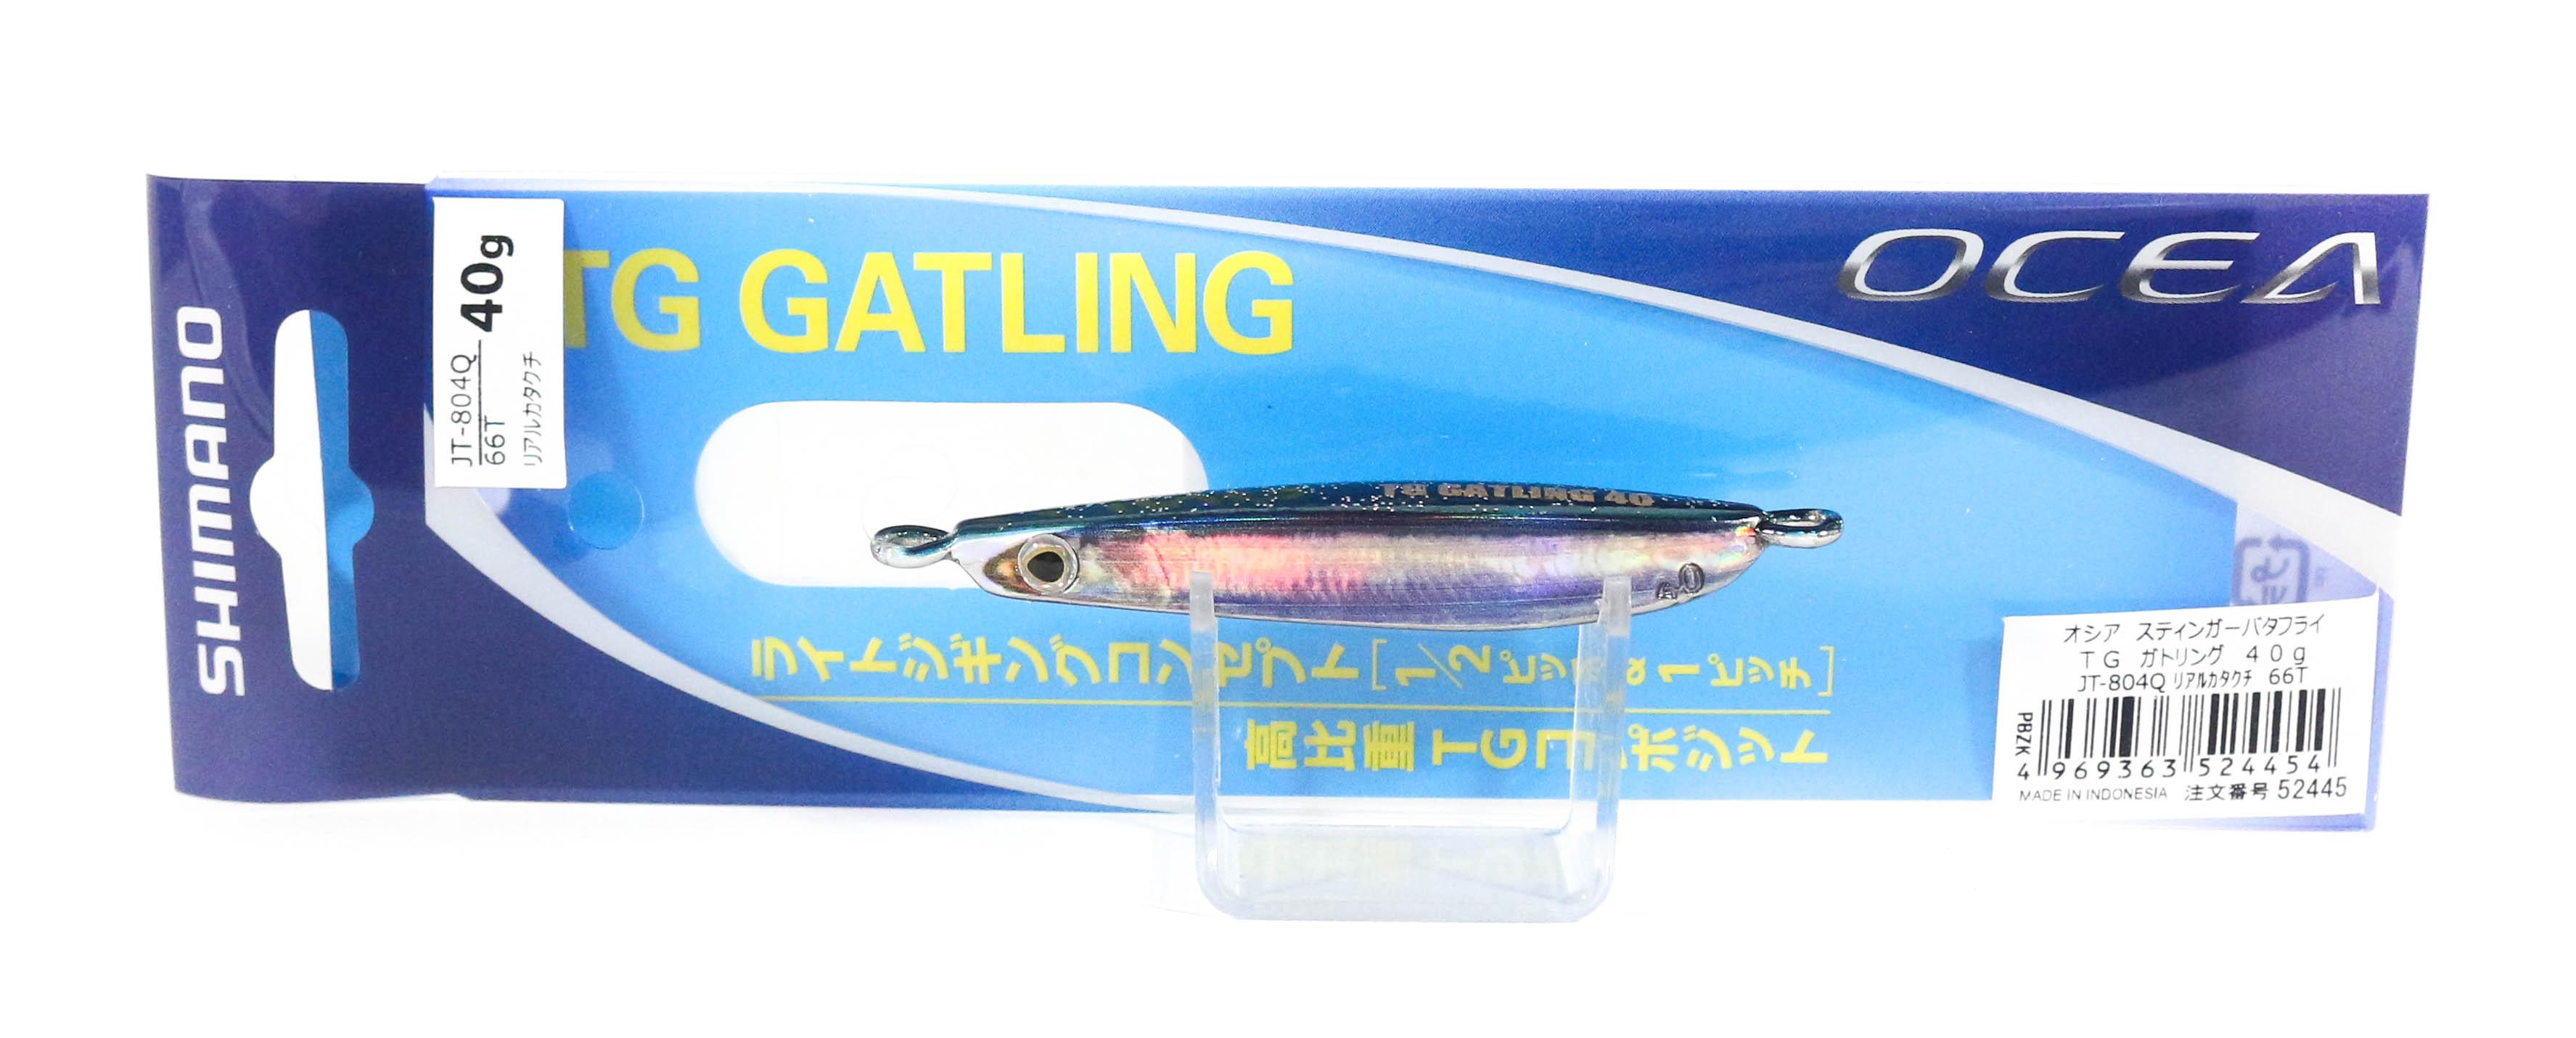 Shimano JT-804Q Metal Jig TG Gatling 40 grams 66T 524454